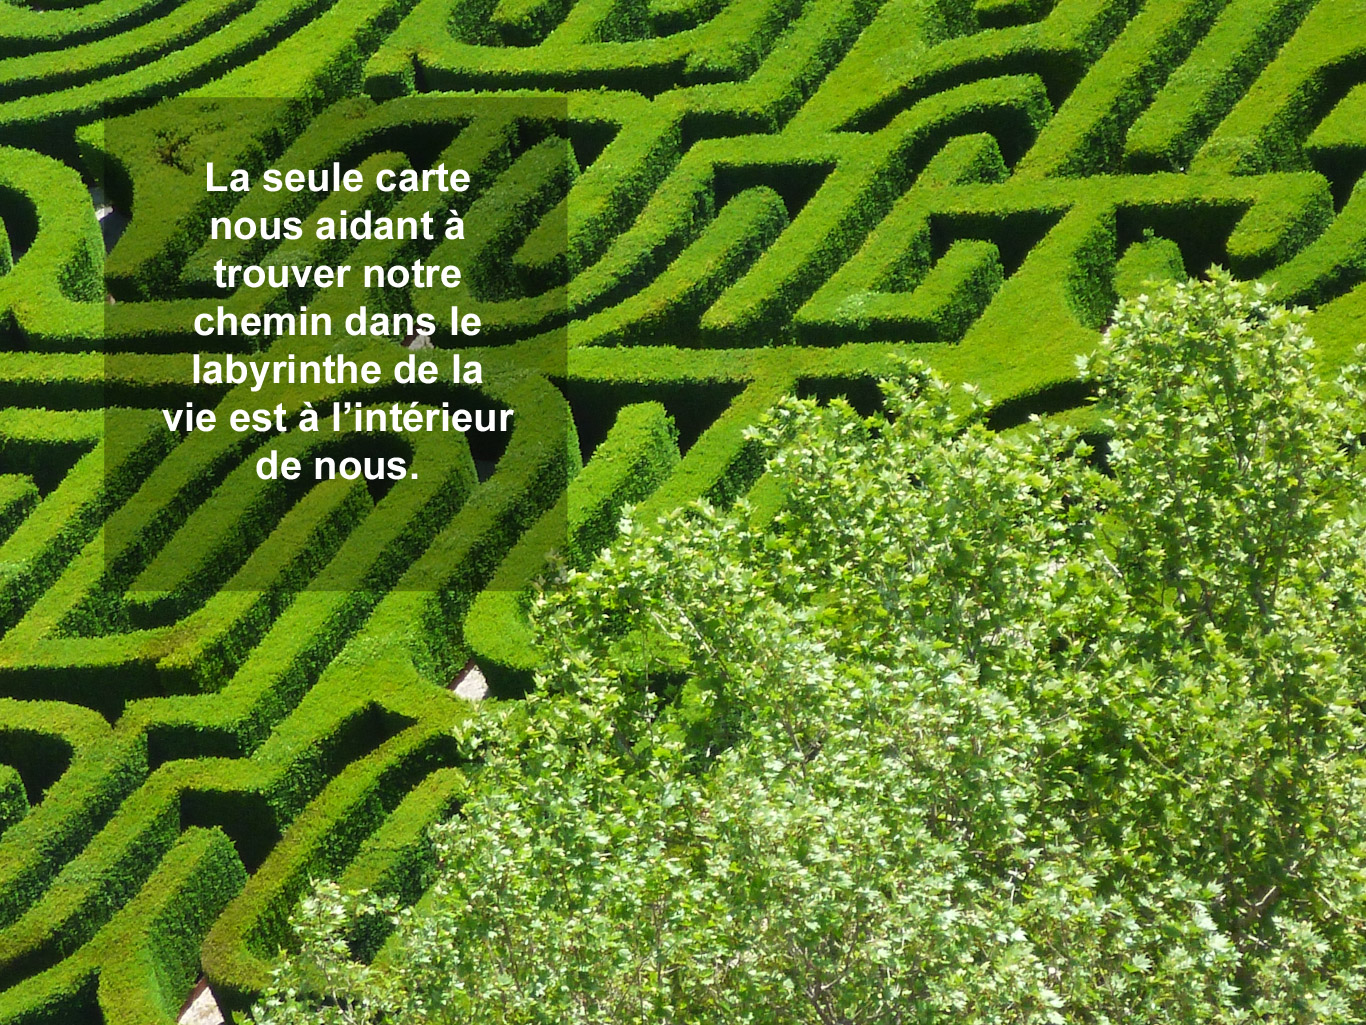 Citation - labyrinthe